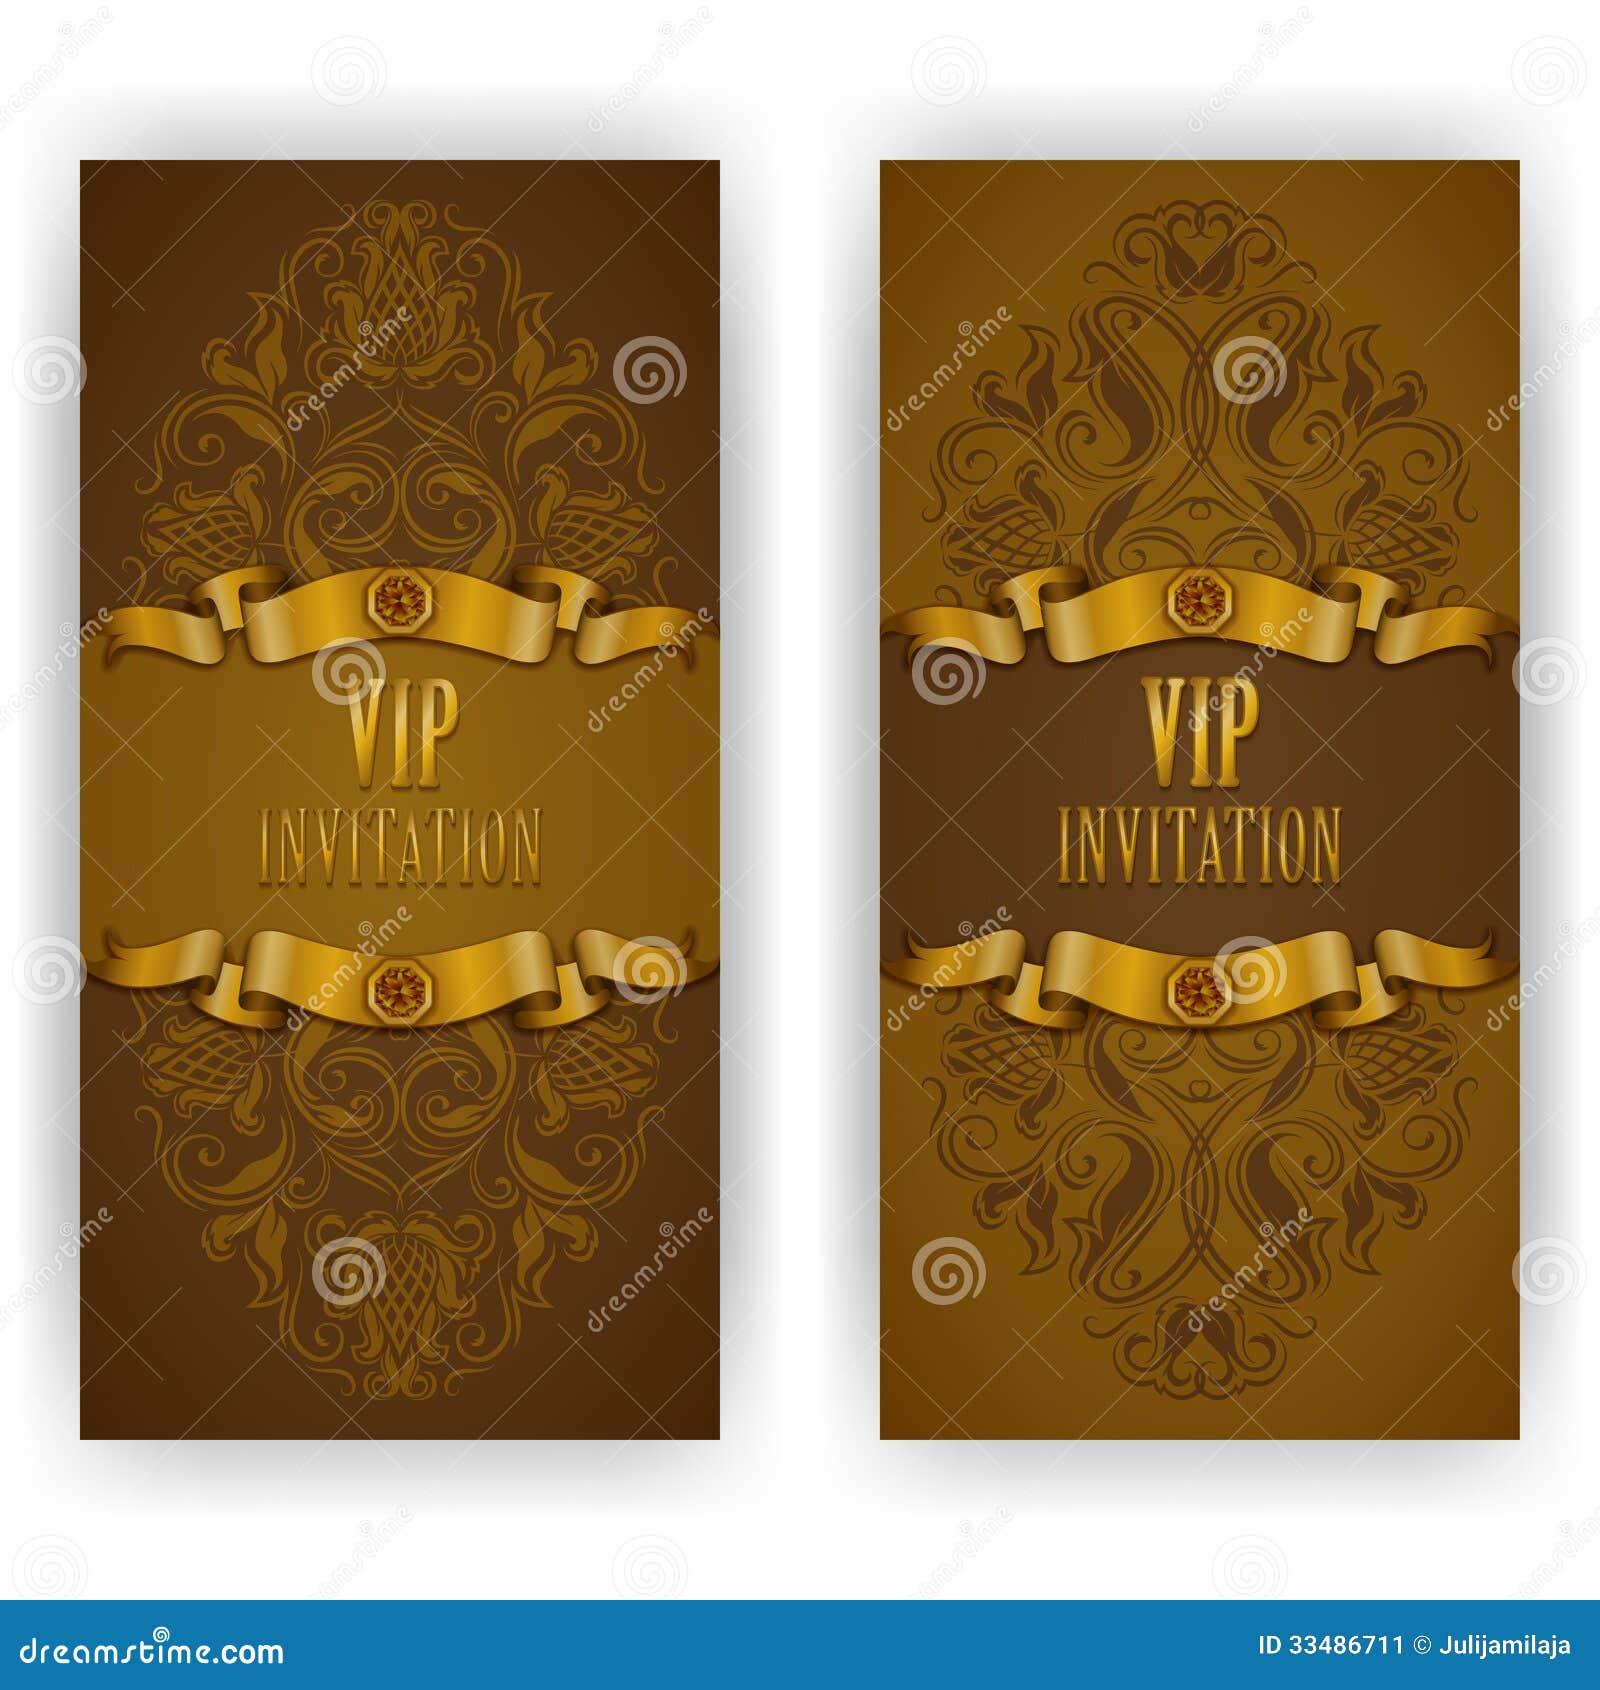 elegant template for vip luxury invitation stock image image 33486711. Black Bedroom Furniture Sets. Home Design Ideas